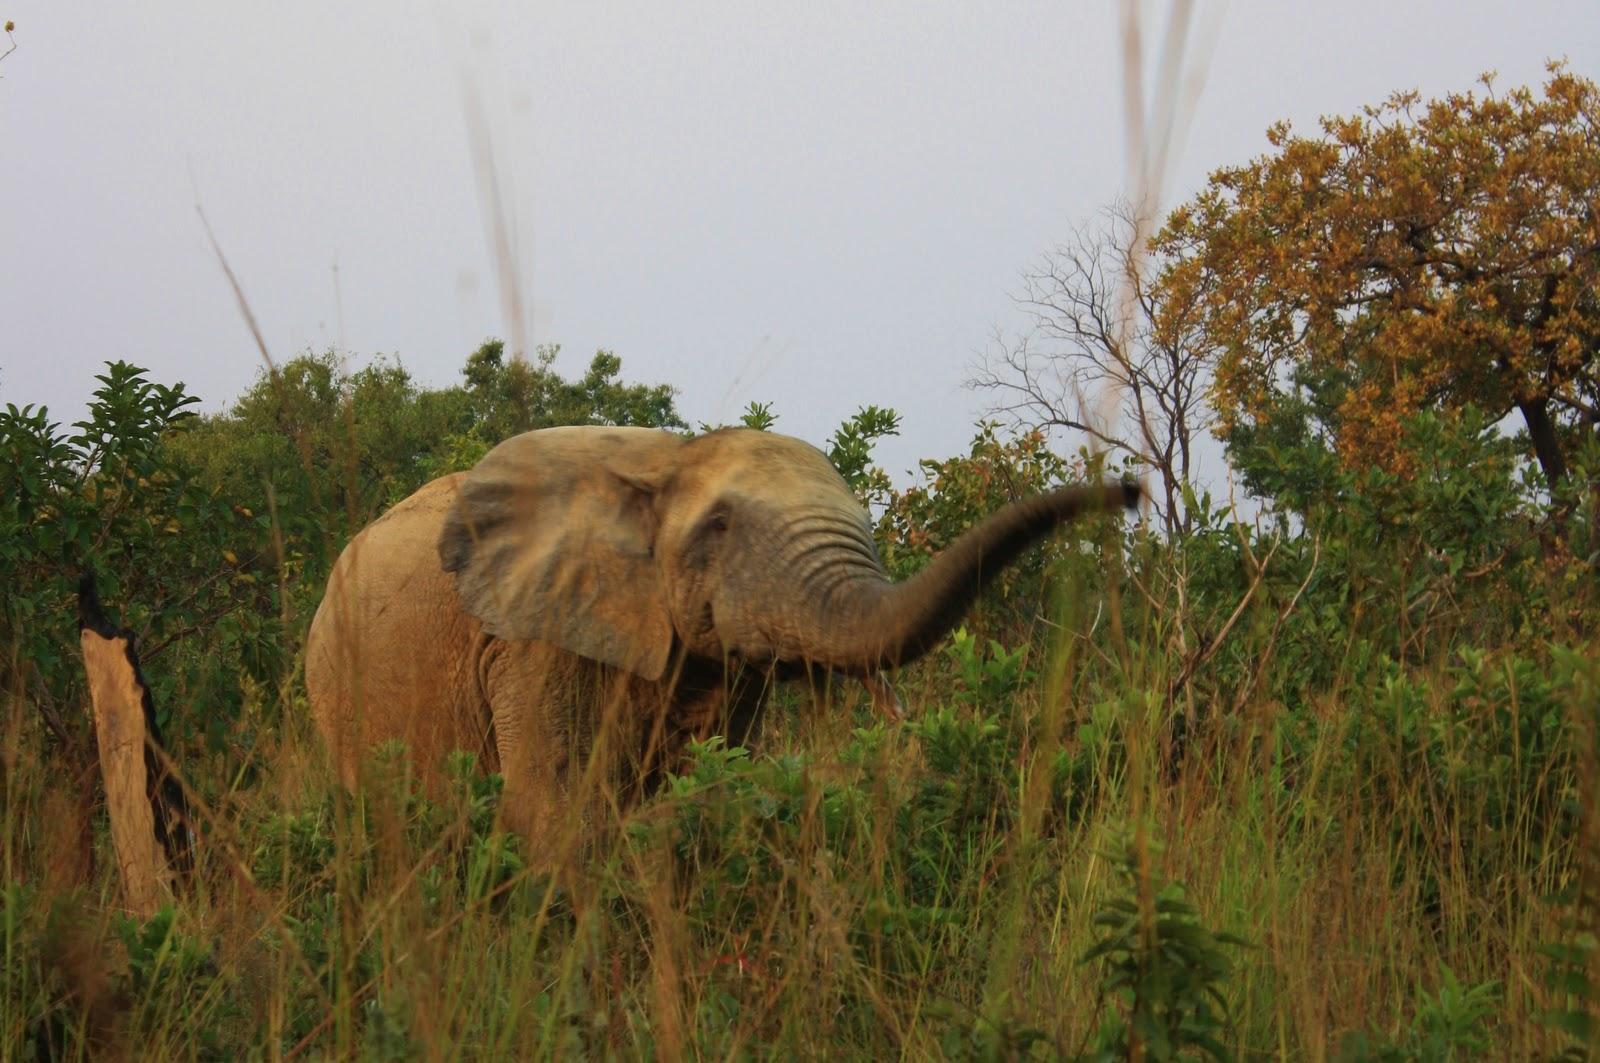 Daplane Datrain Dakar: Don't Think of an Elephant